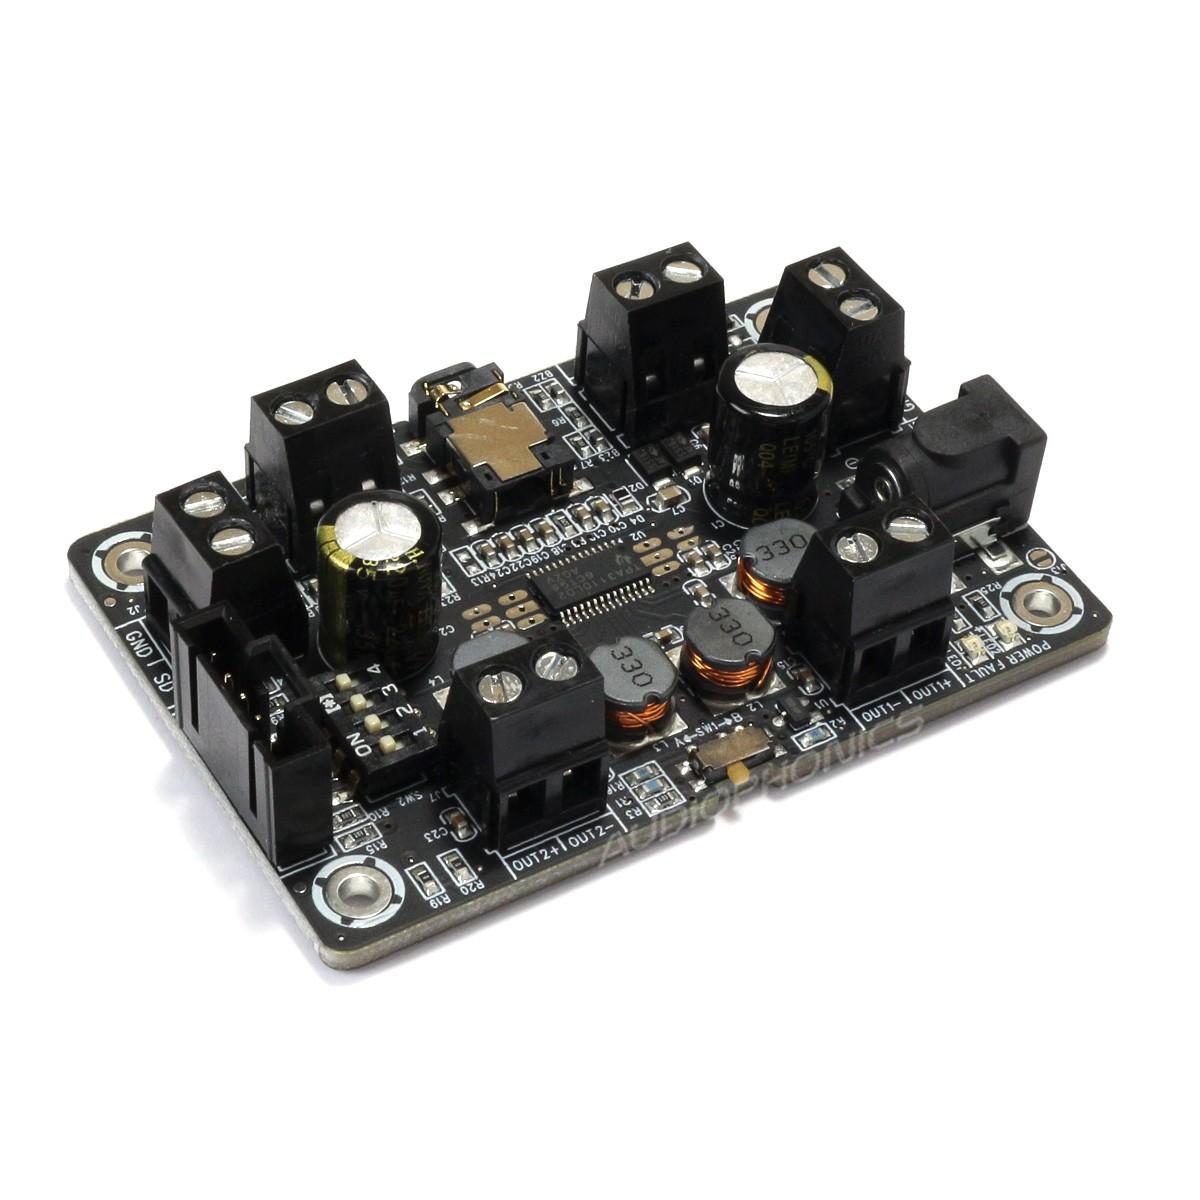 WONDOM AA-AB32231 Audio Amplifier Board TPA3110 2 x 8 Watts 4 Ohms Class D